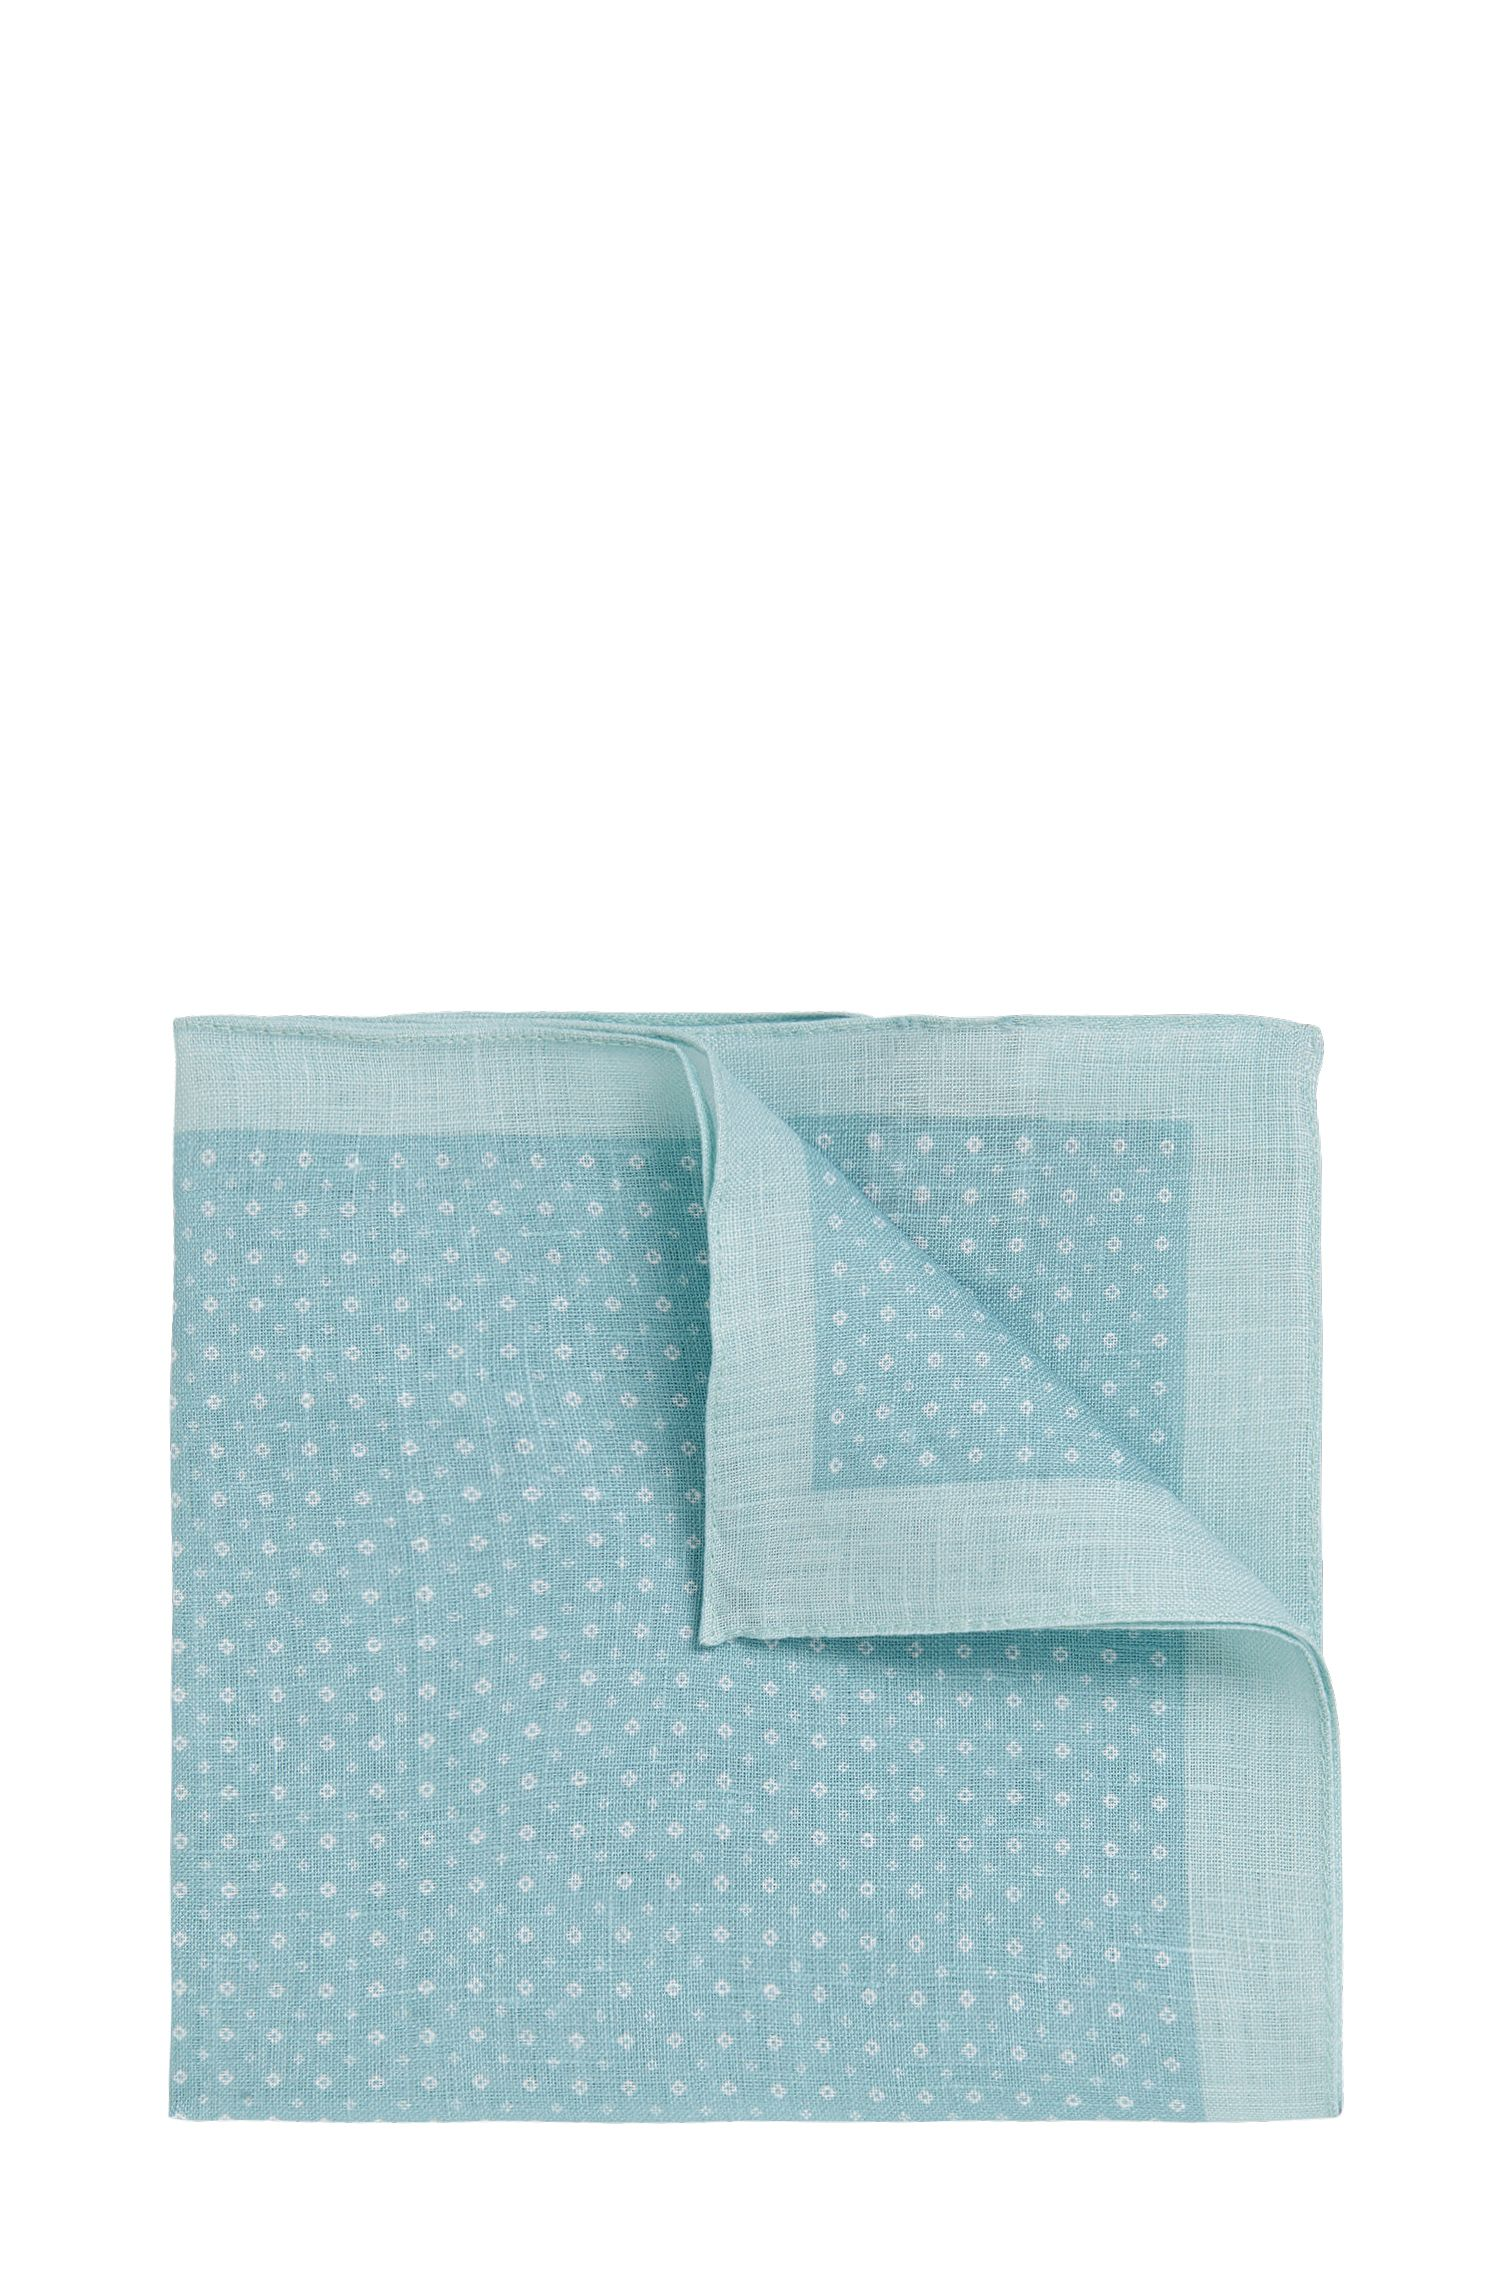 'T-Pocket Square 33 x 33'   Linen Pocket Square